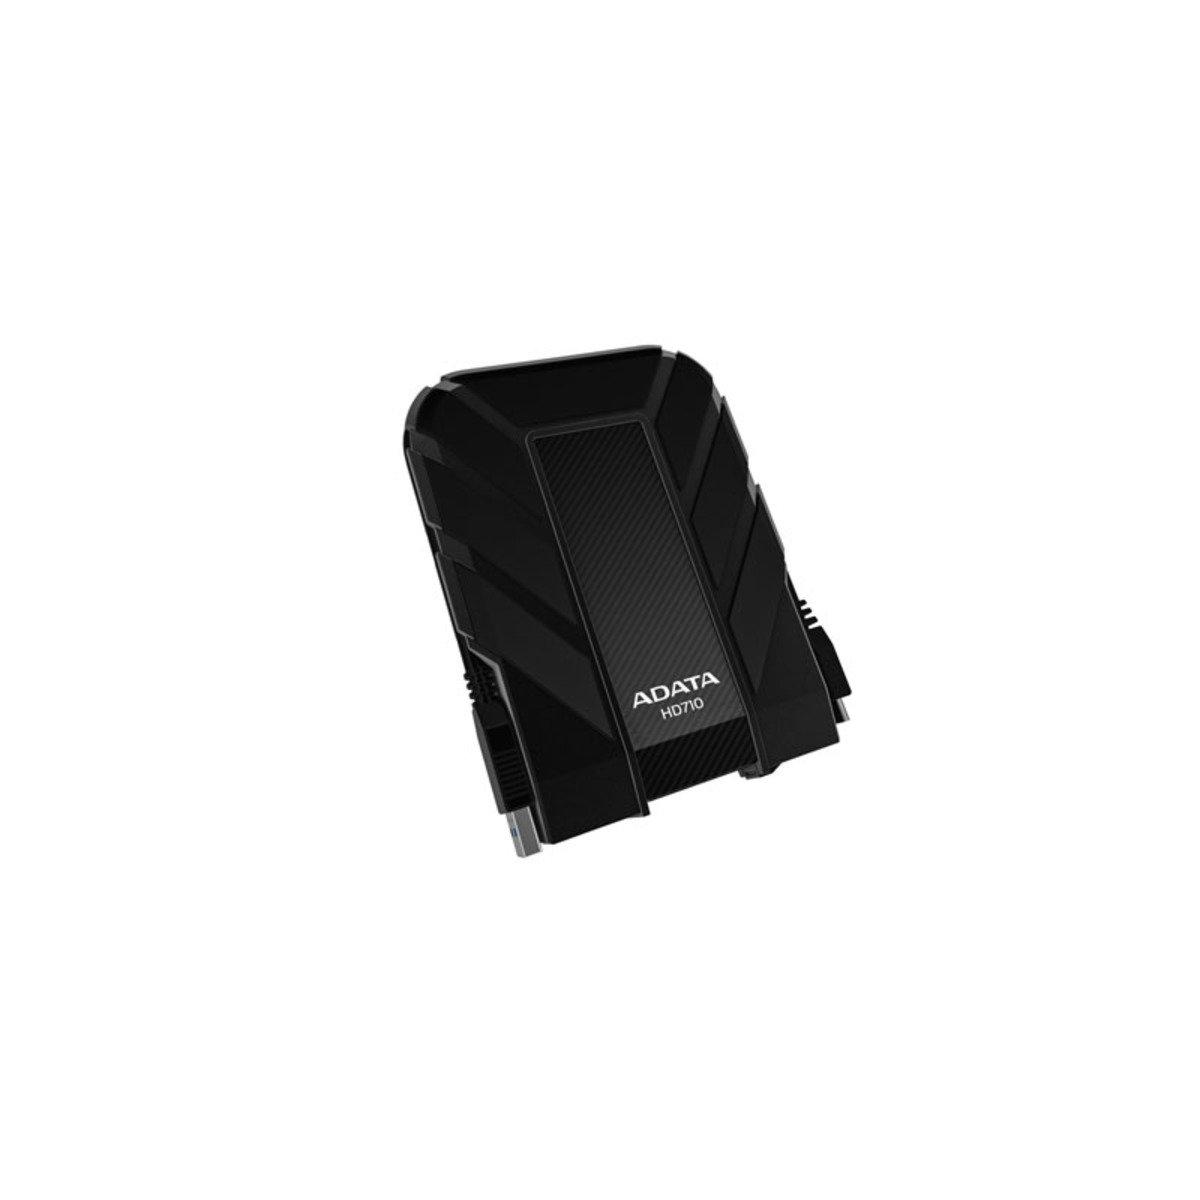 IP68 防水、防塵、抗震 USB 3.0 外置硬碟 HD710 1TB 黑色